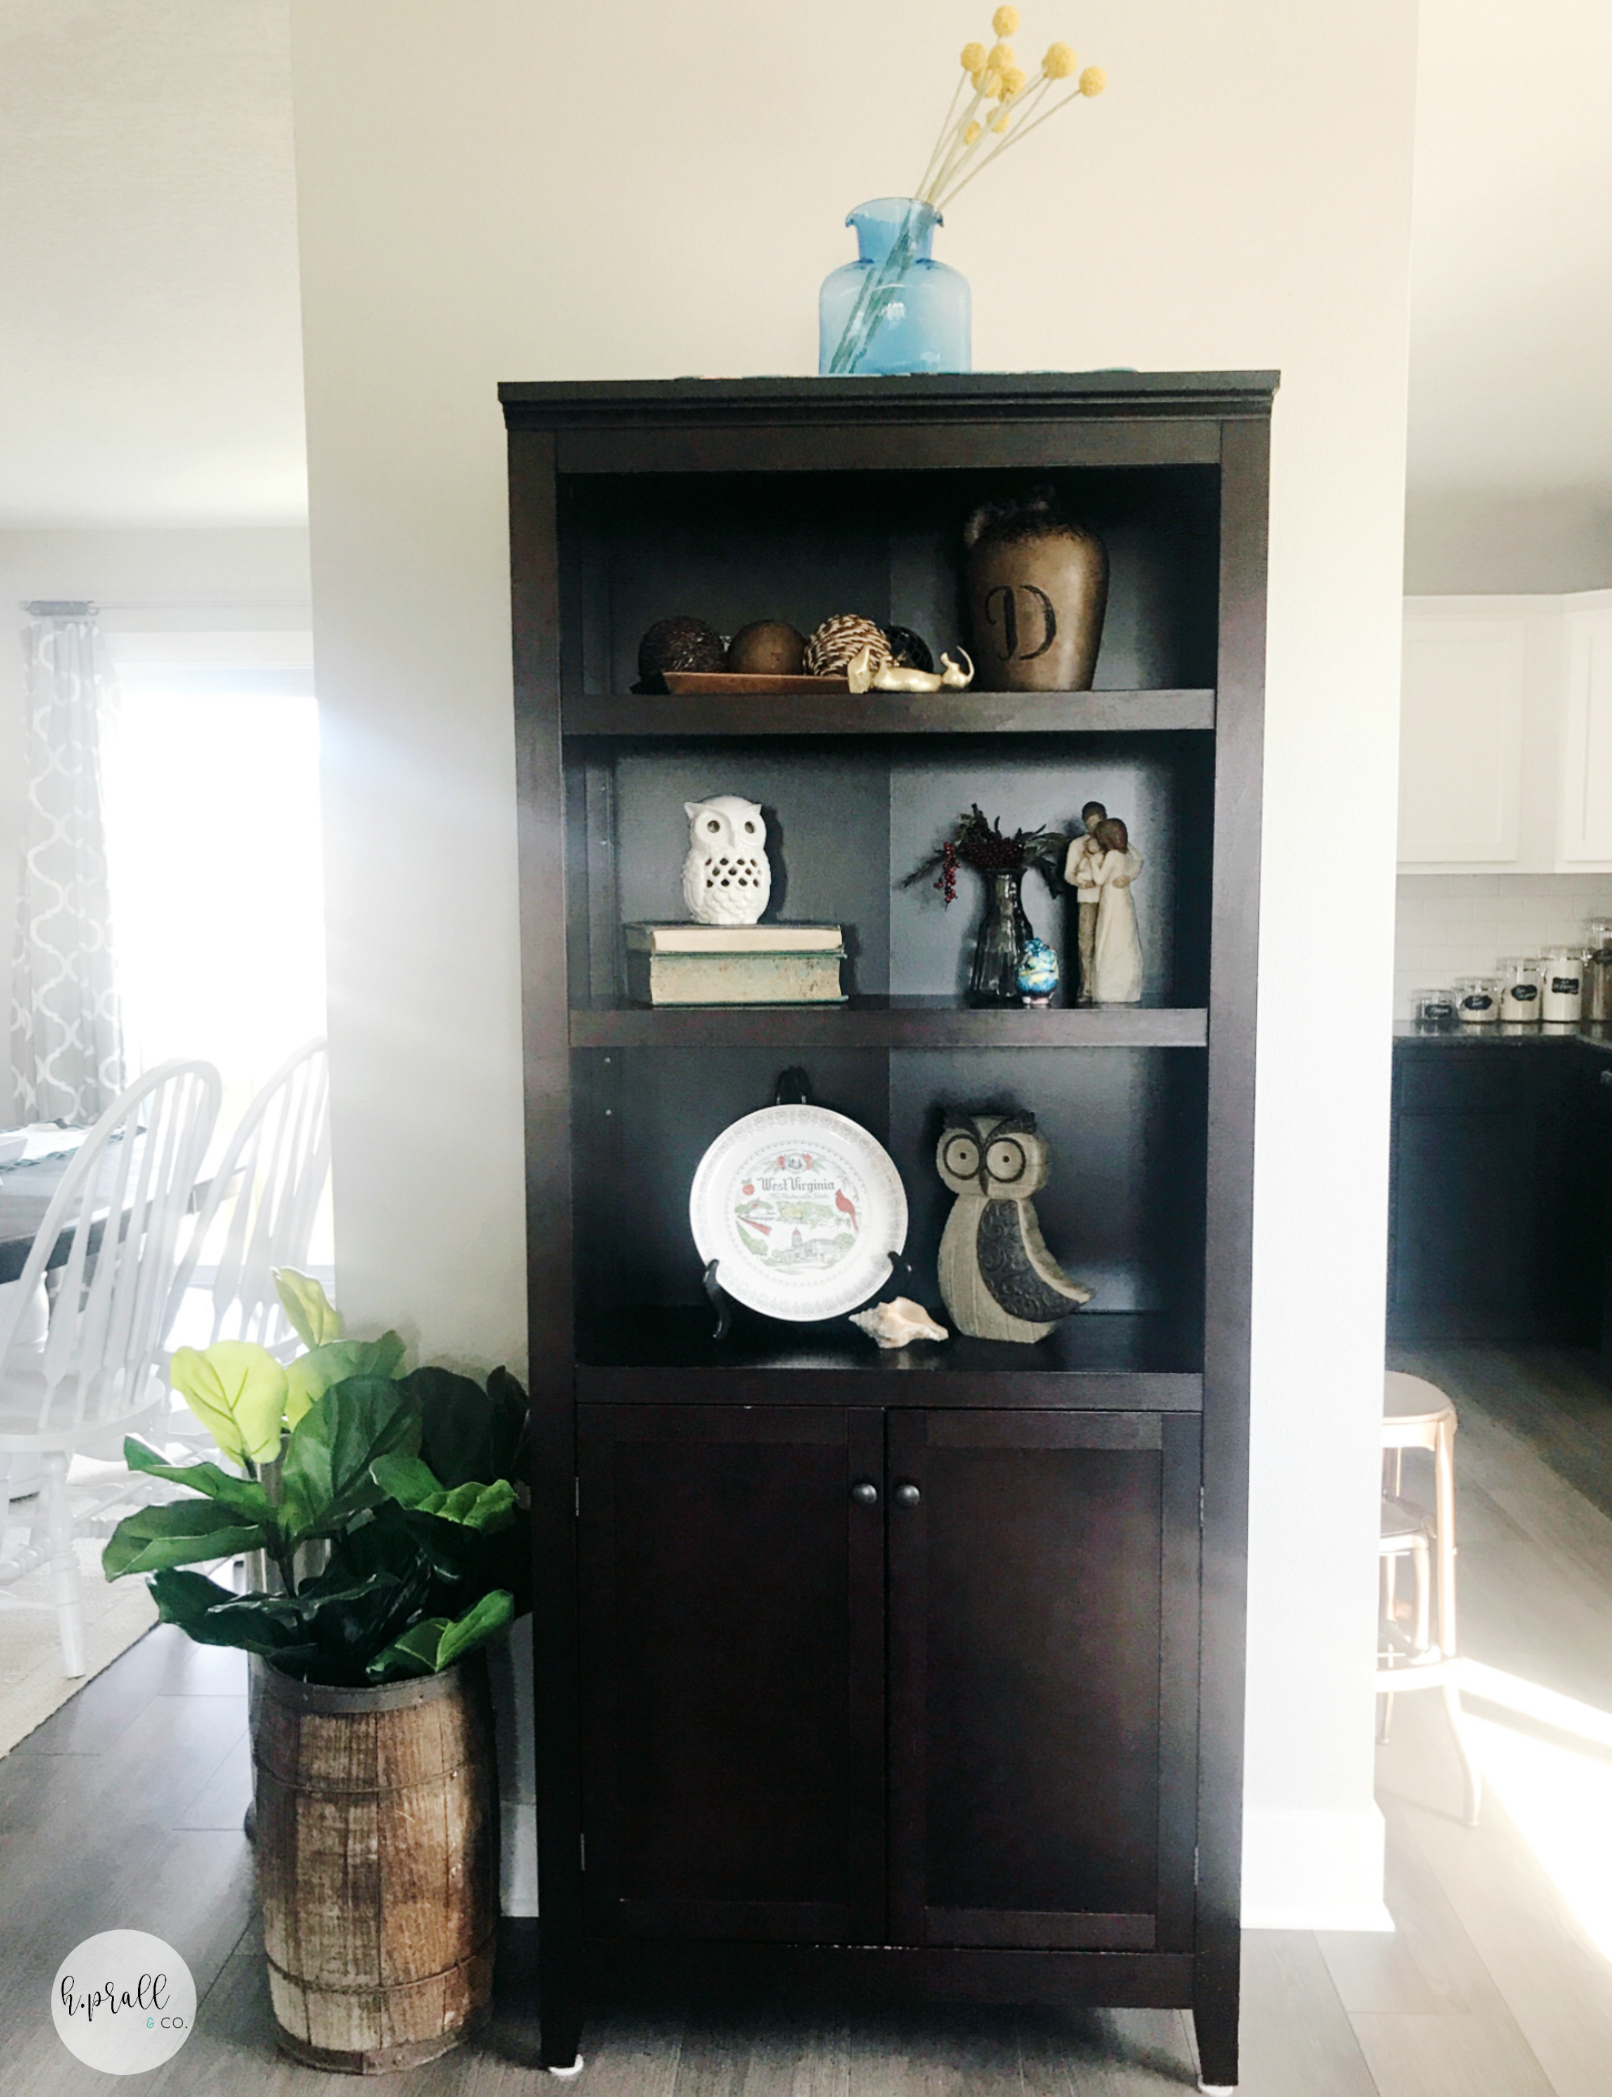 Shelf Styling by H.Prall & Co. | hprallandco.com